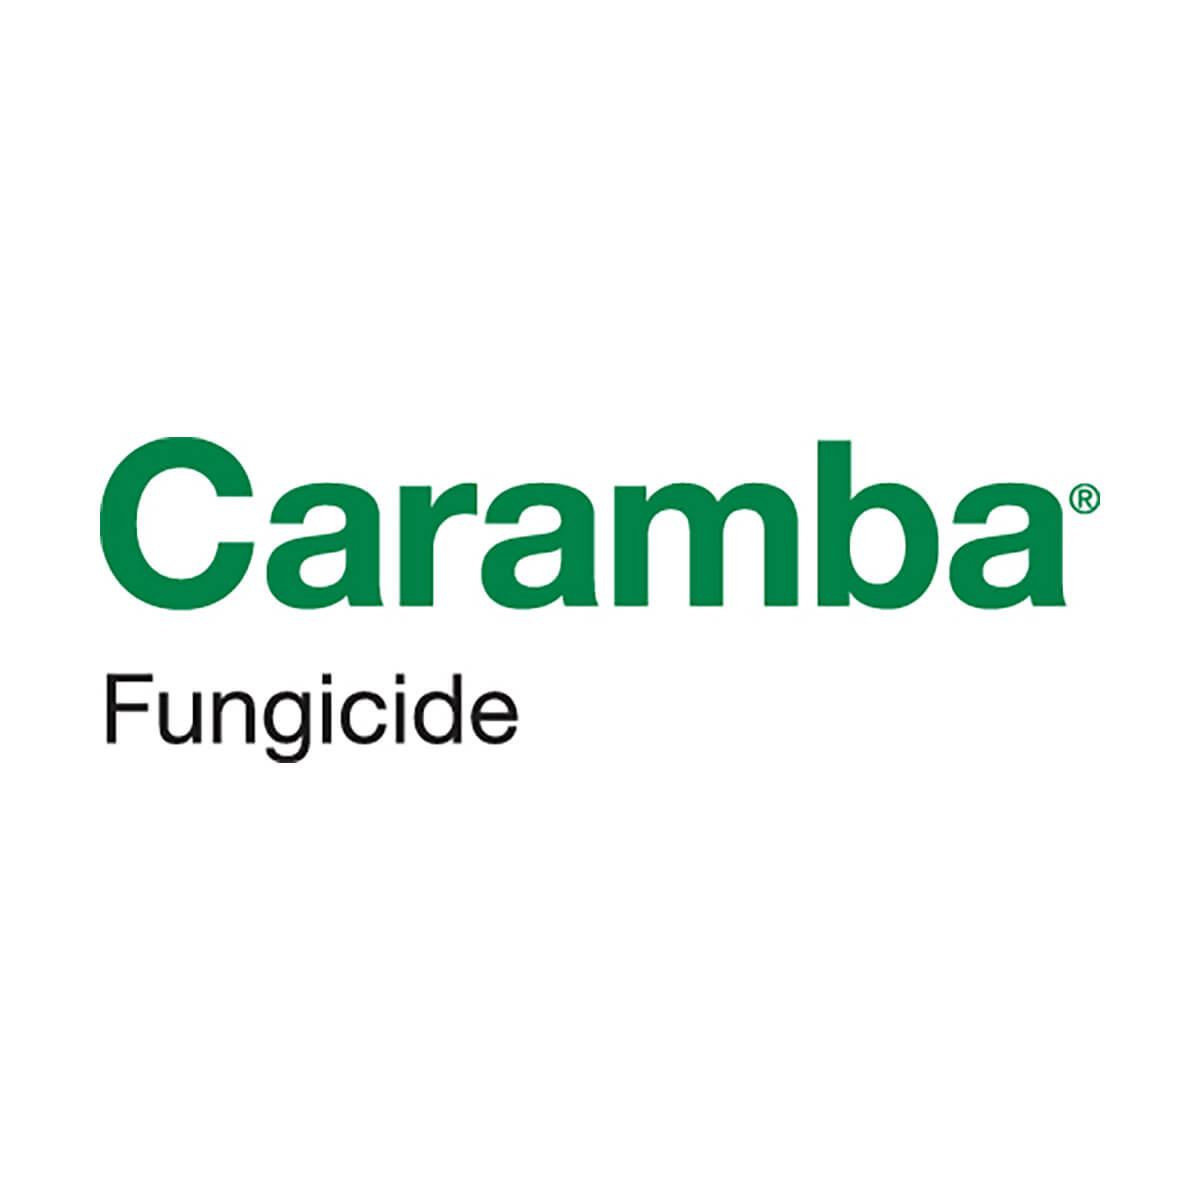 Caramba® Fungicide - 8.1 L Jug